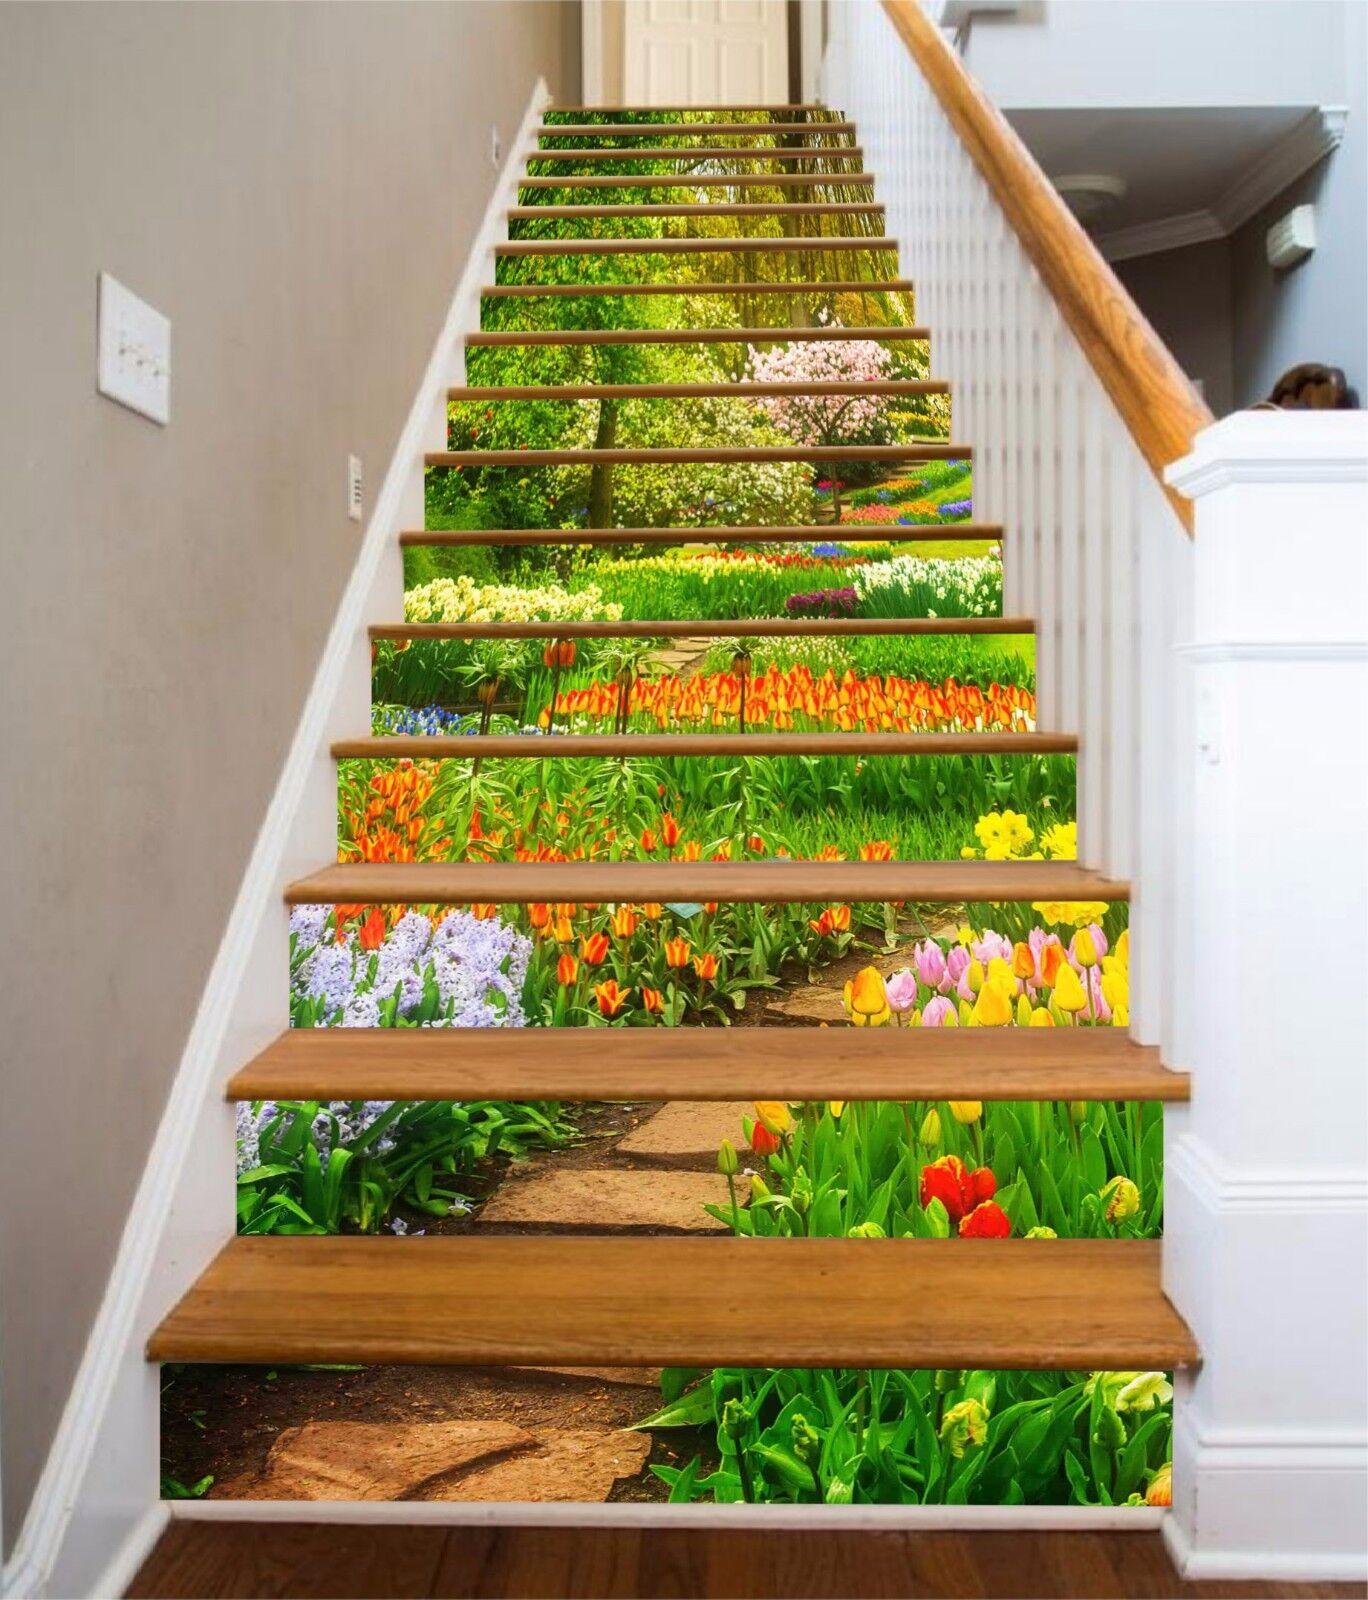 3D Lawn grass road4 Stair Risers Decoration Photo Mural Vinyl Decal Wallpaper UK